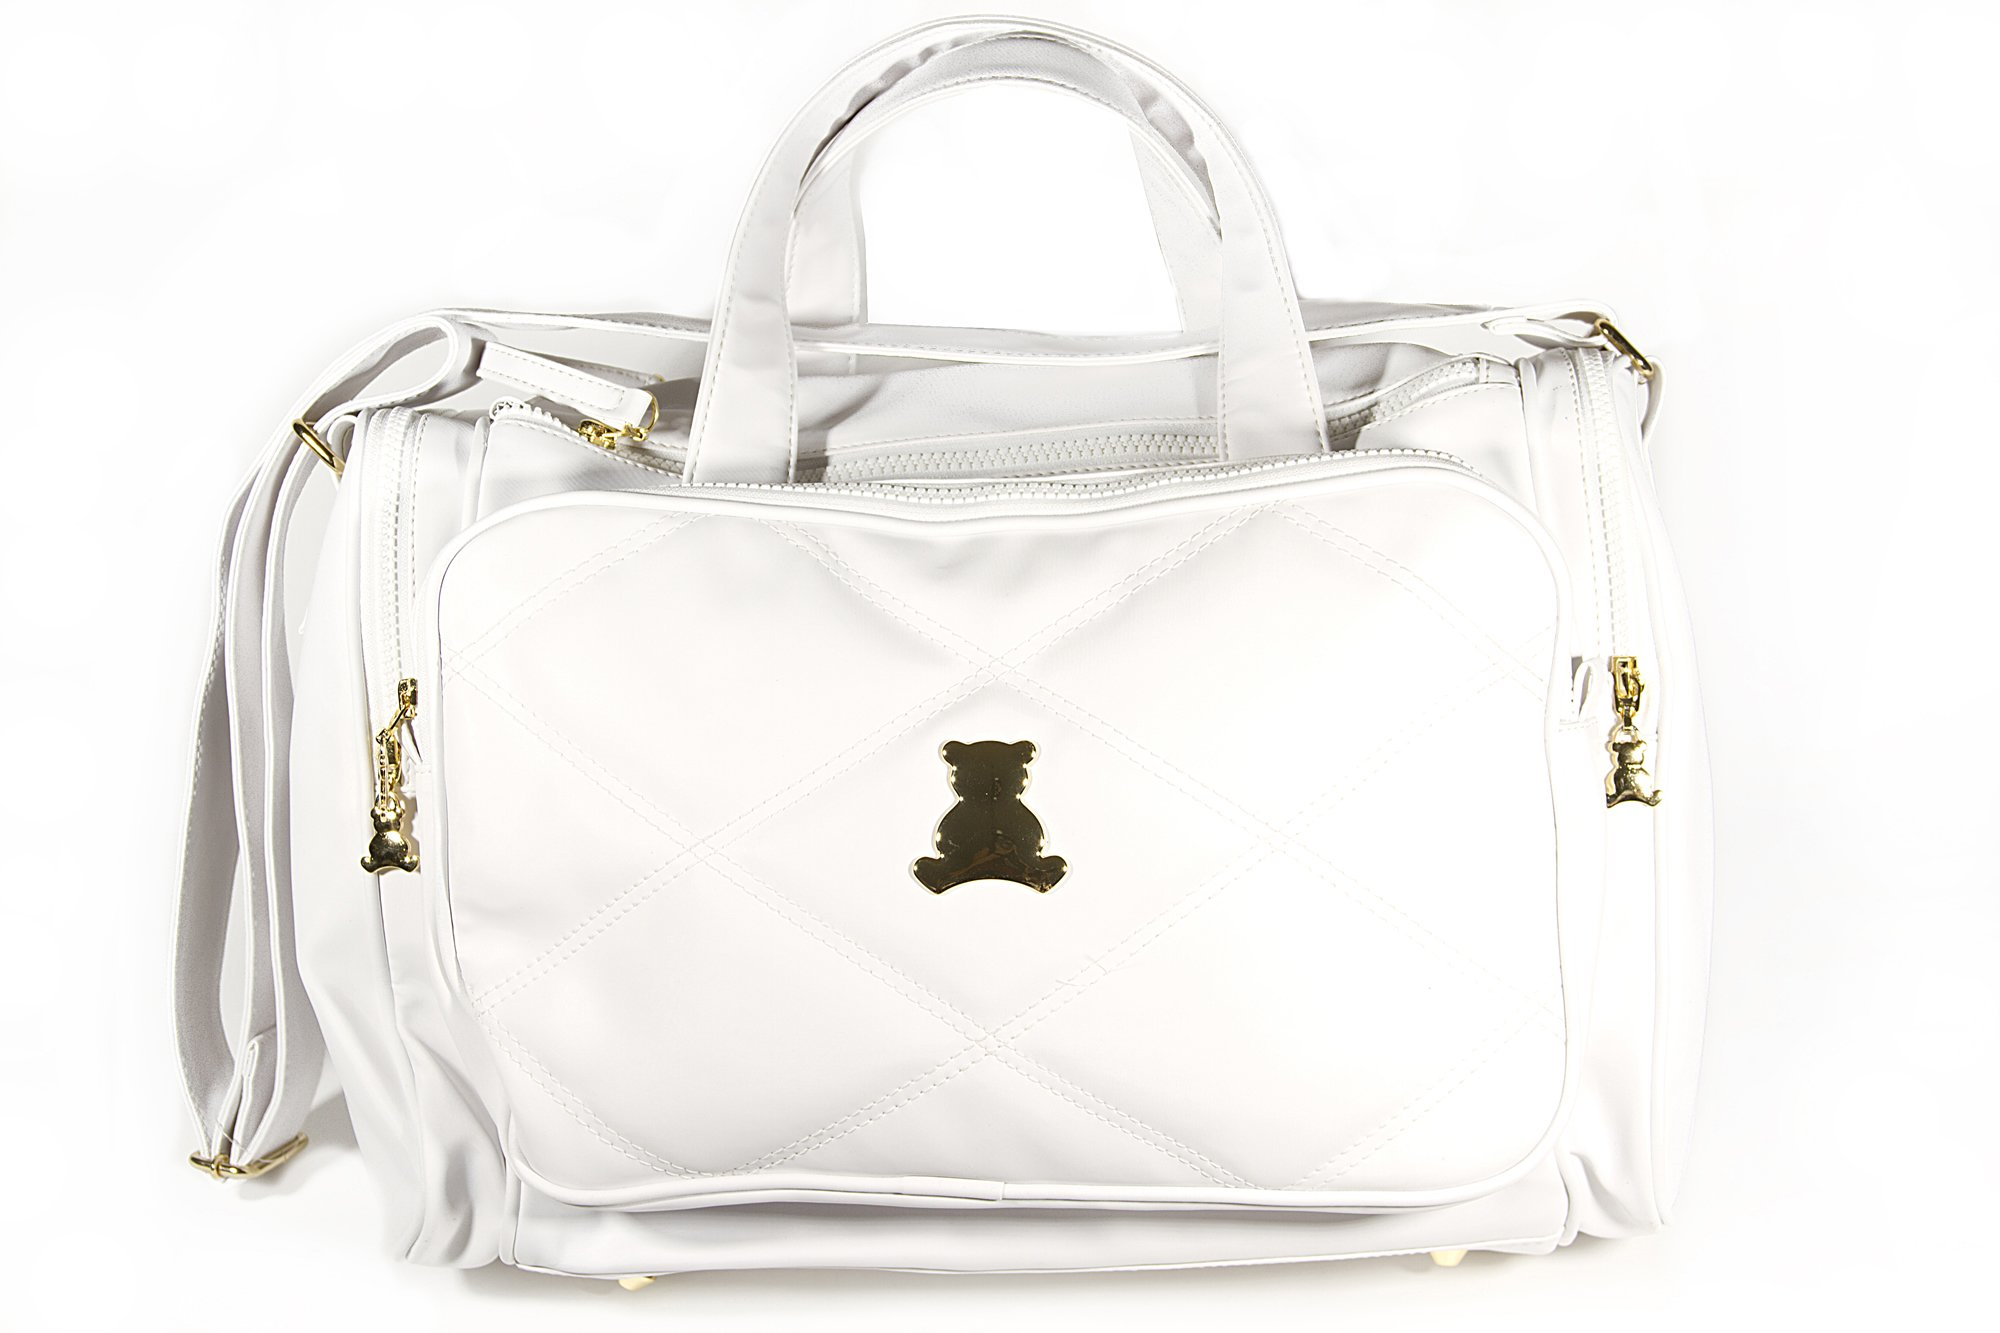 BL BABY - Elegance Collec. - MED -crossbody Bag - Themal - White - 5x15x10''